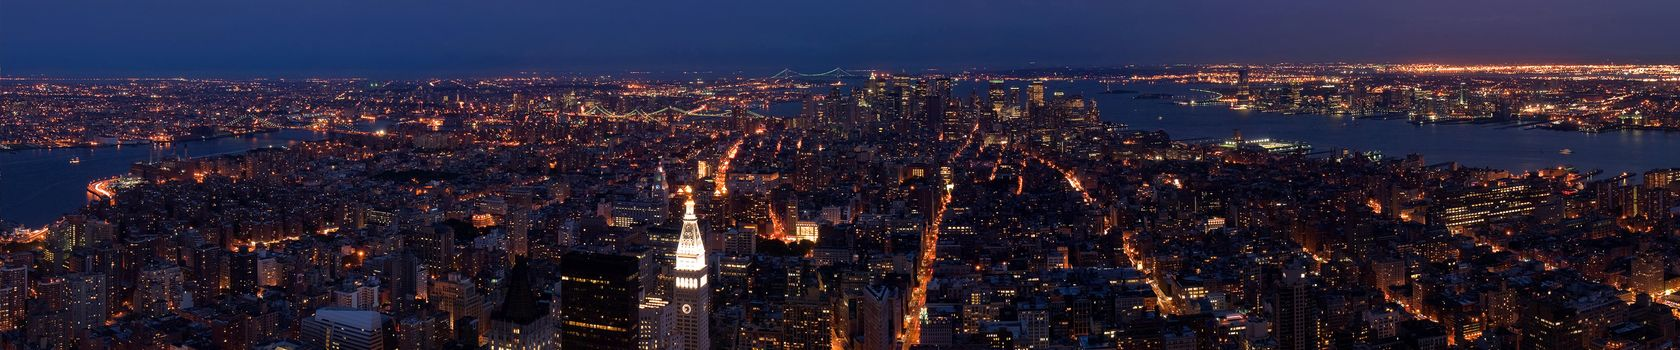 Photo free city, cityscape, night